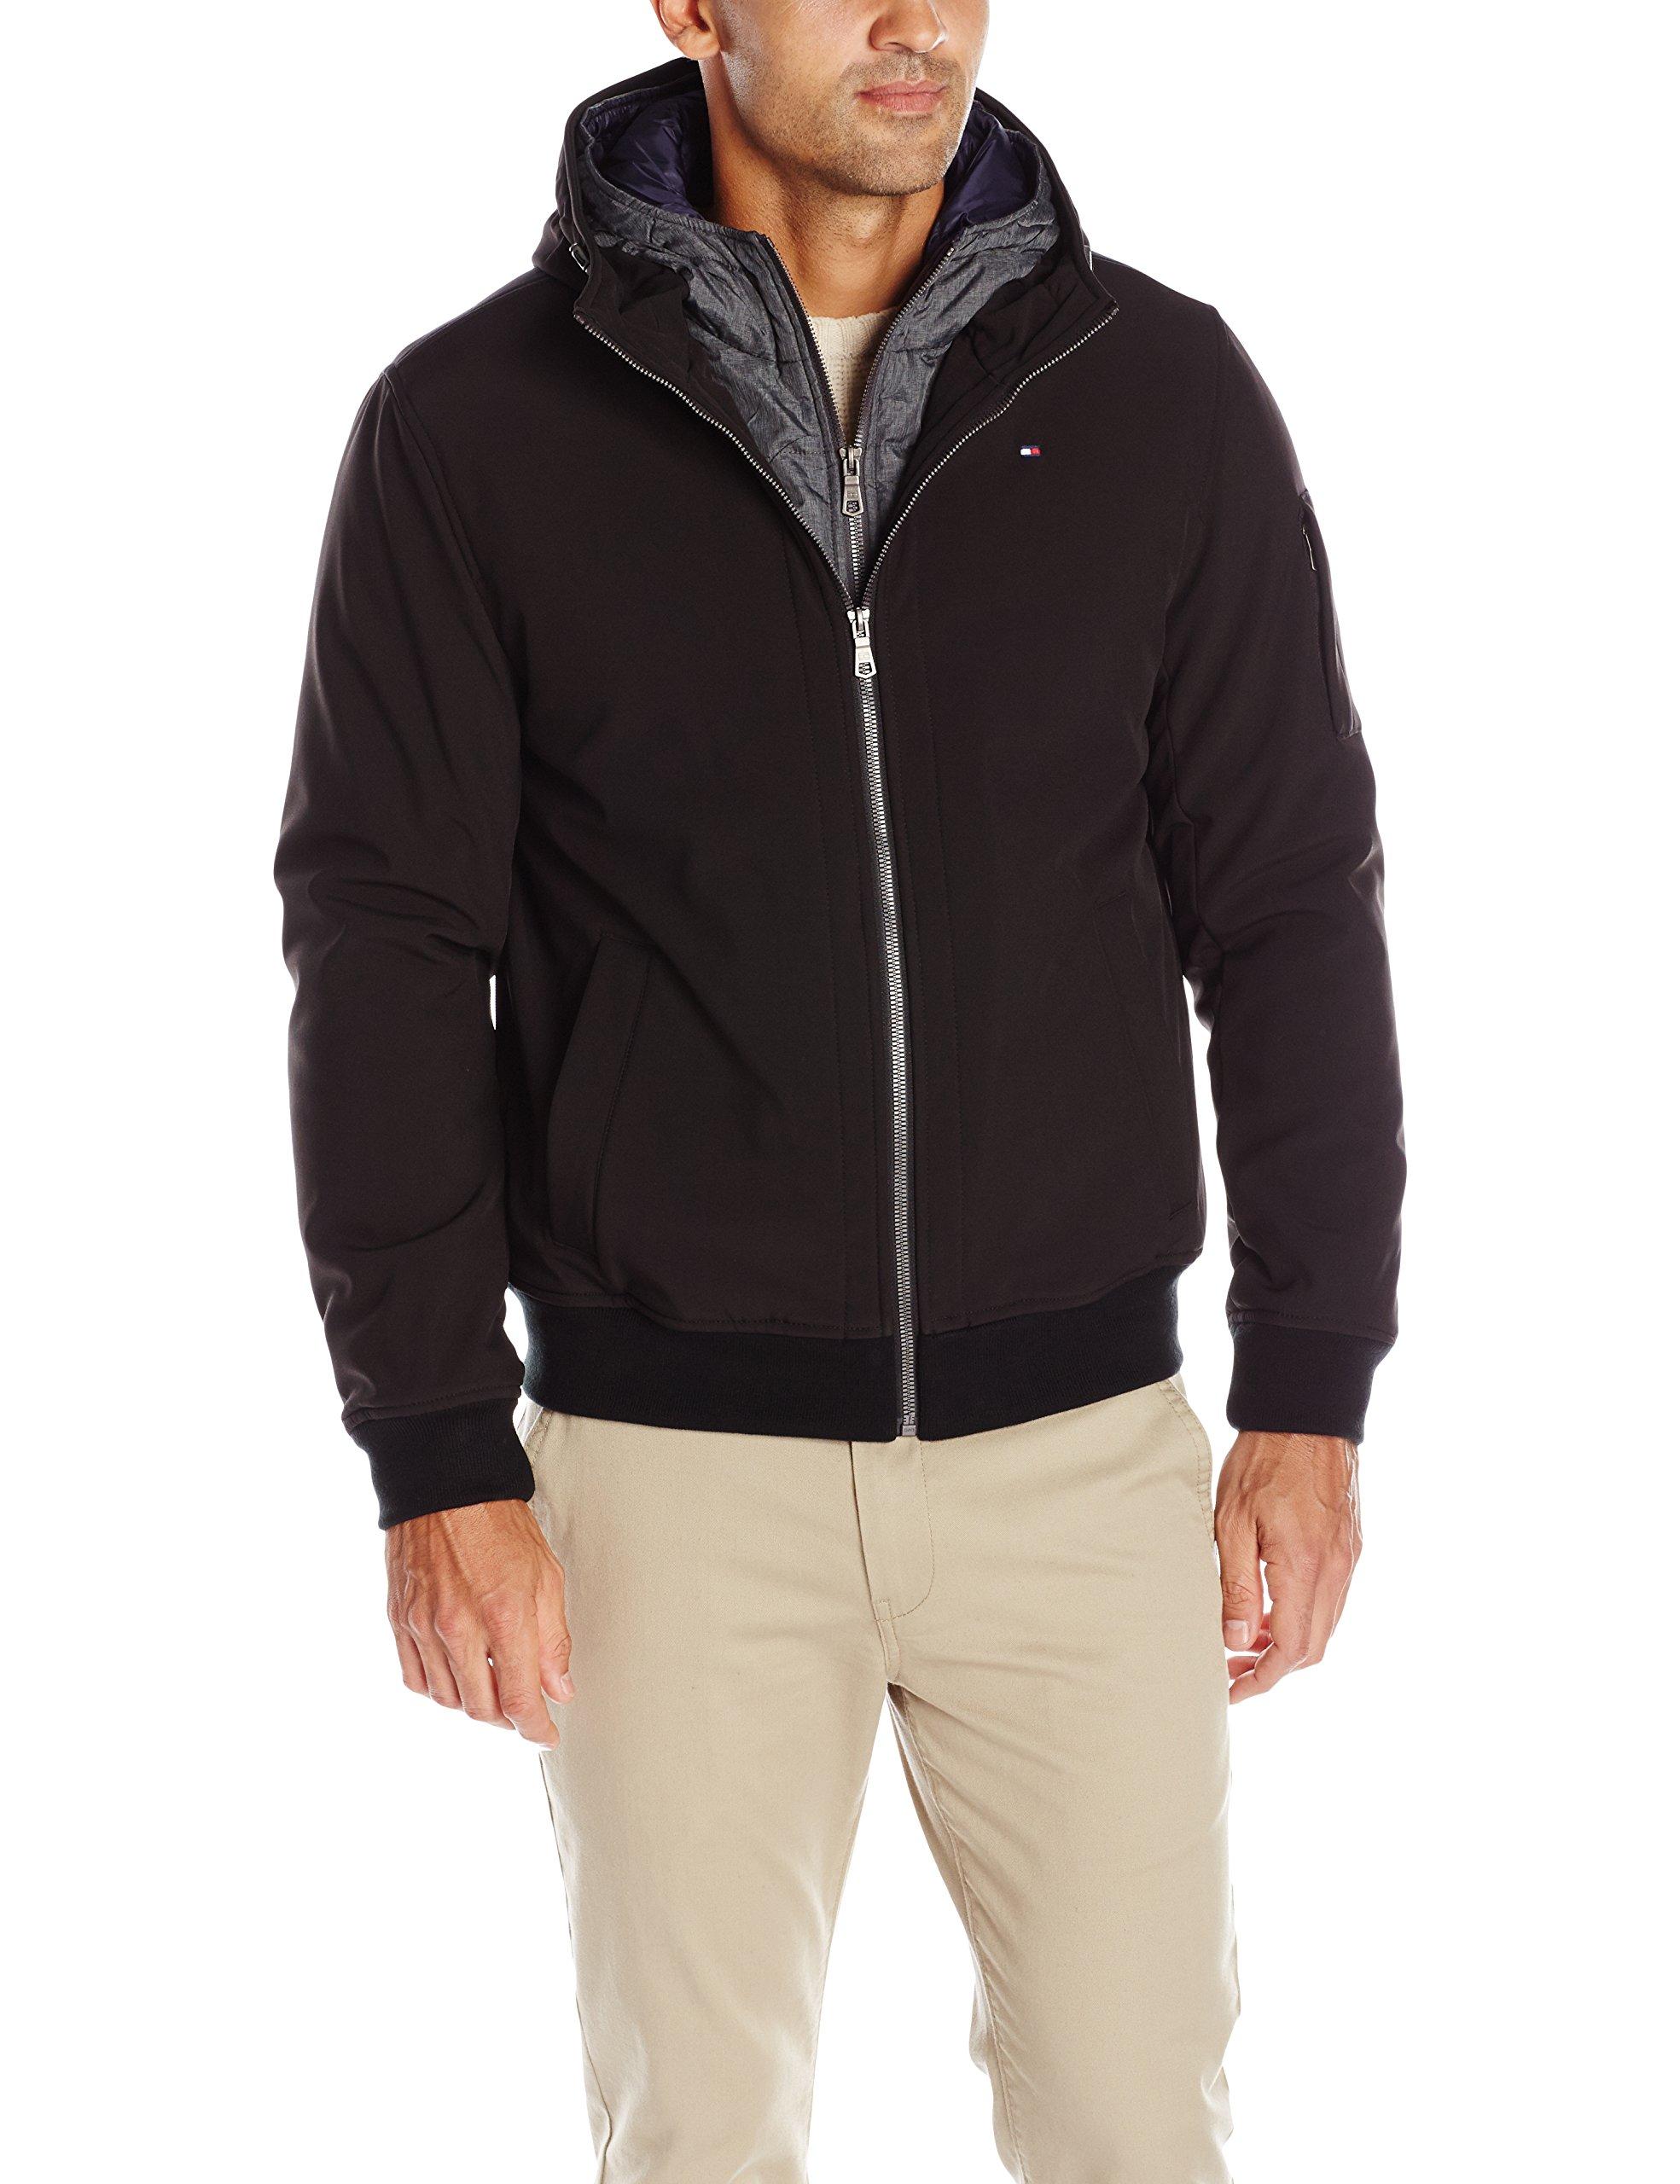 Tommy Hilfiger Men's Soft Shell Fashion Bomber with Contrast Bib and Hood, Black/Heather Grey Bib, S